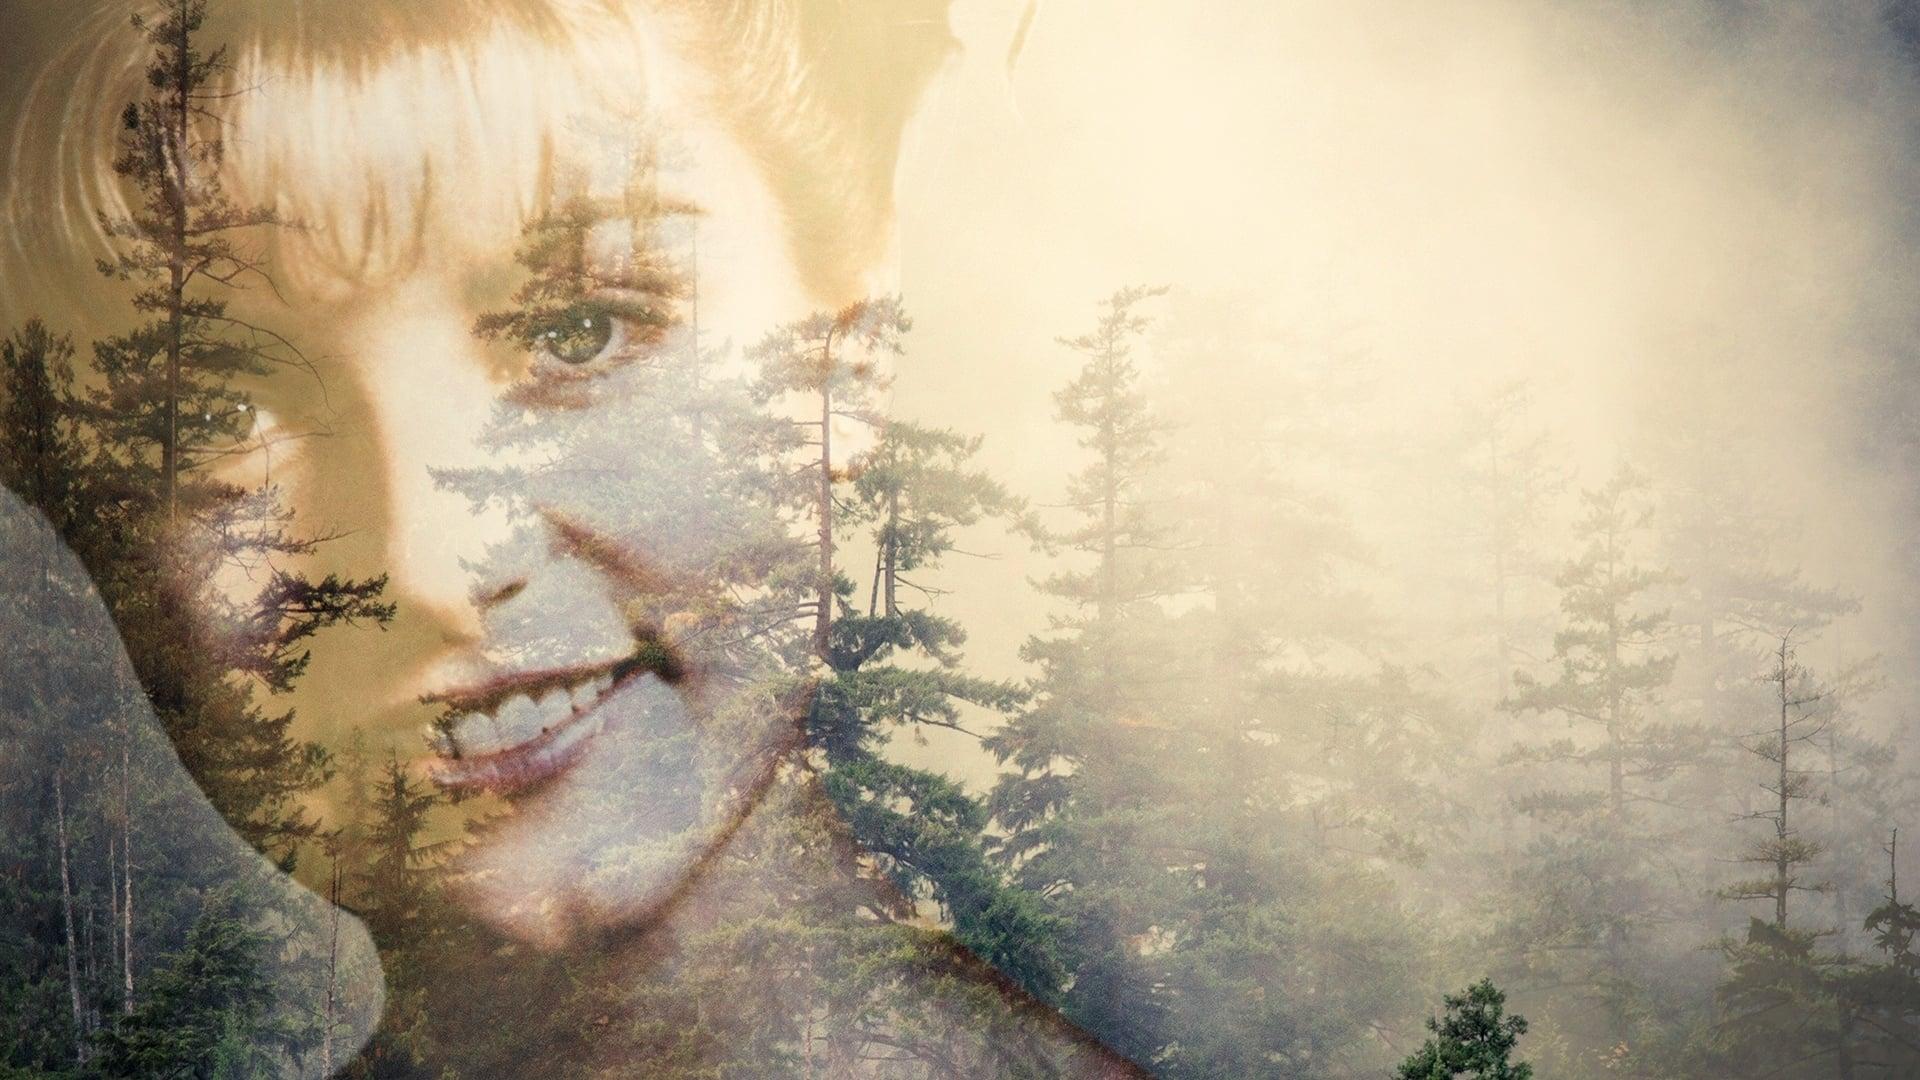 Return of Twin Peaks up in the air